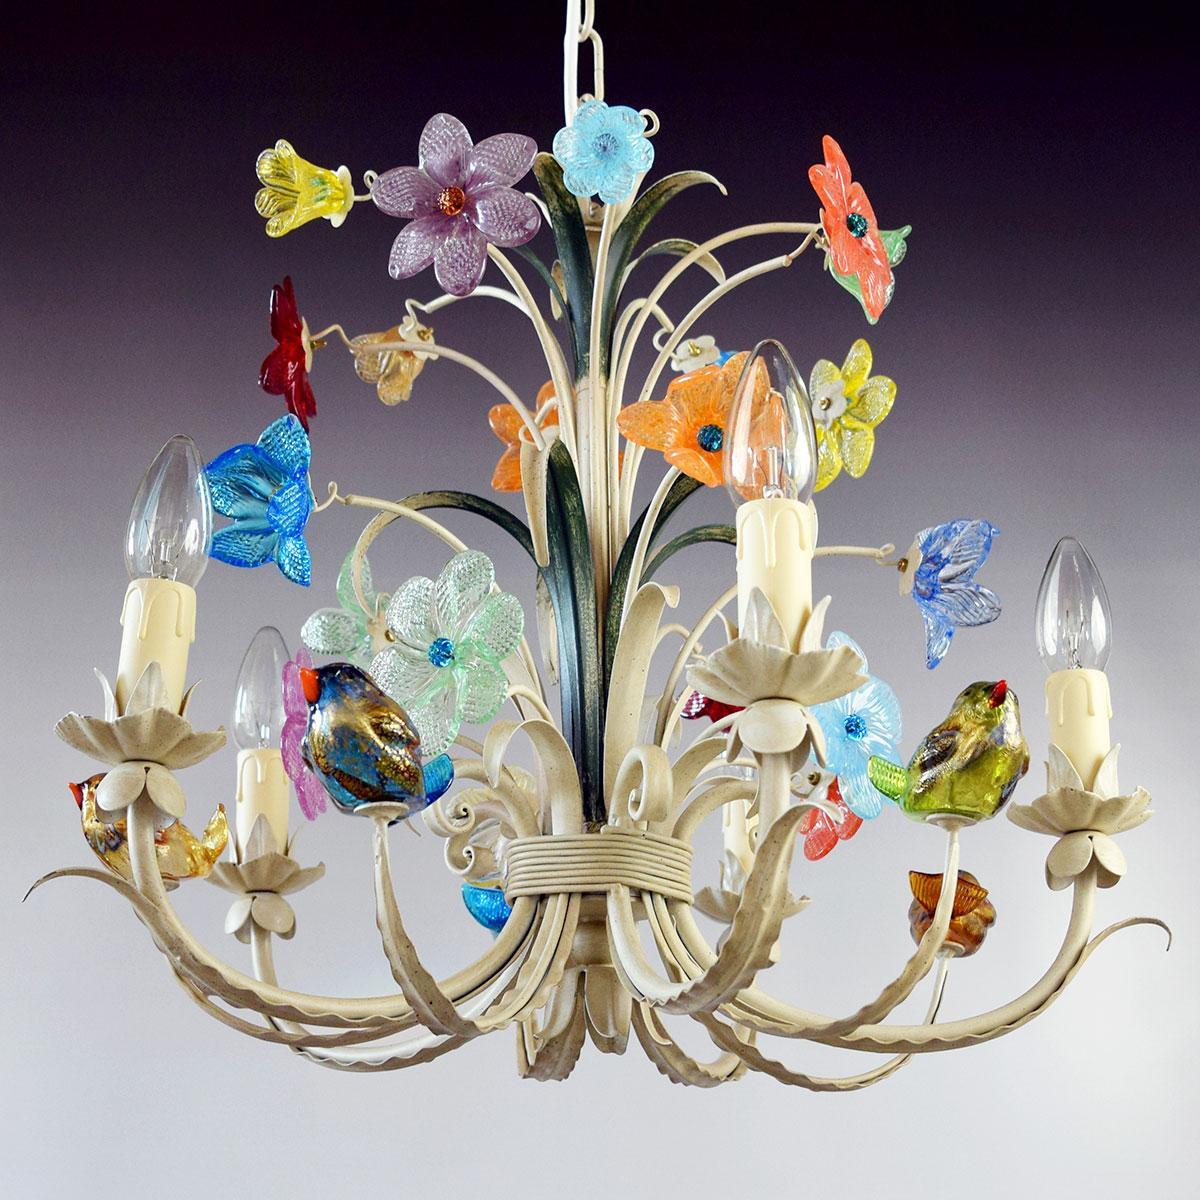 """Crema"" Murano glas Kronleuchter - 5 flammig"